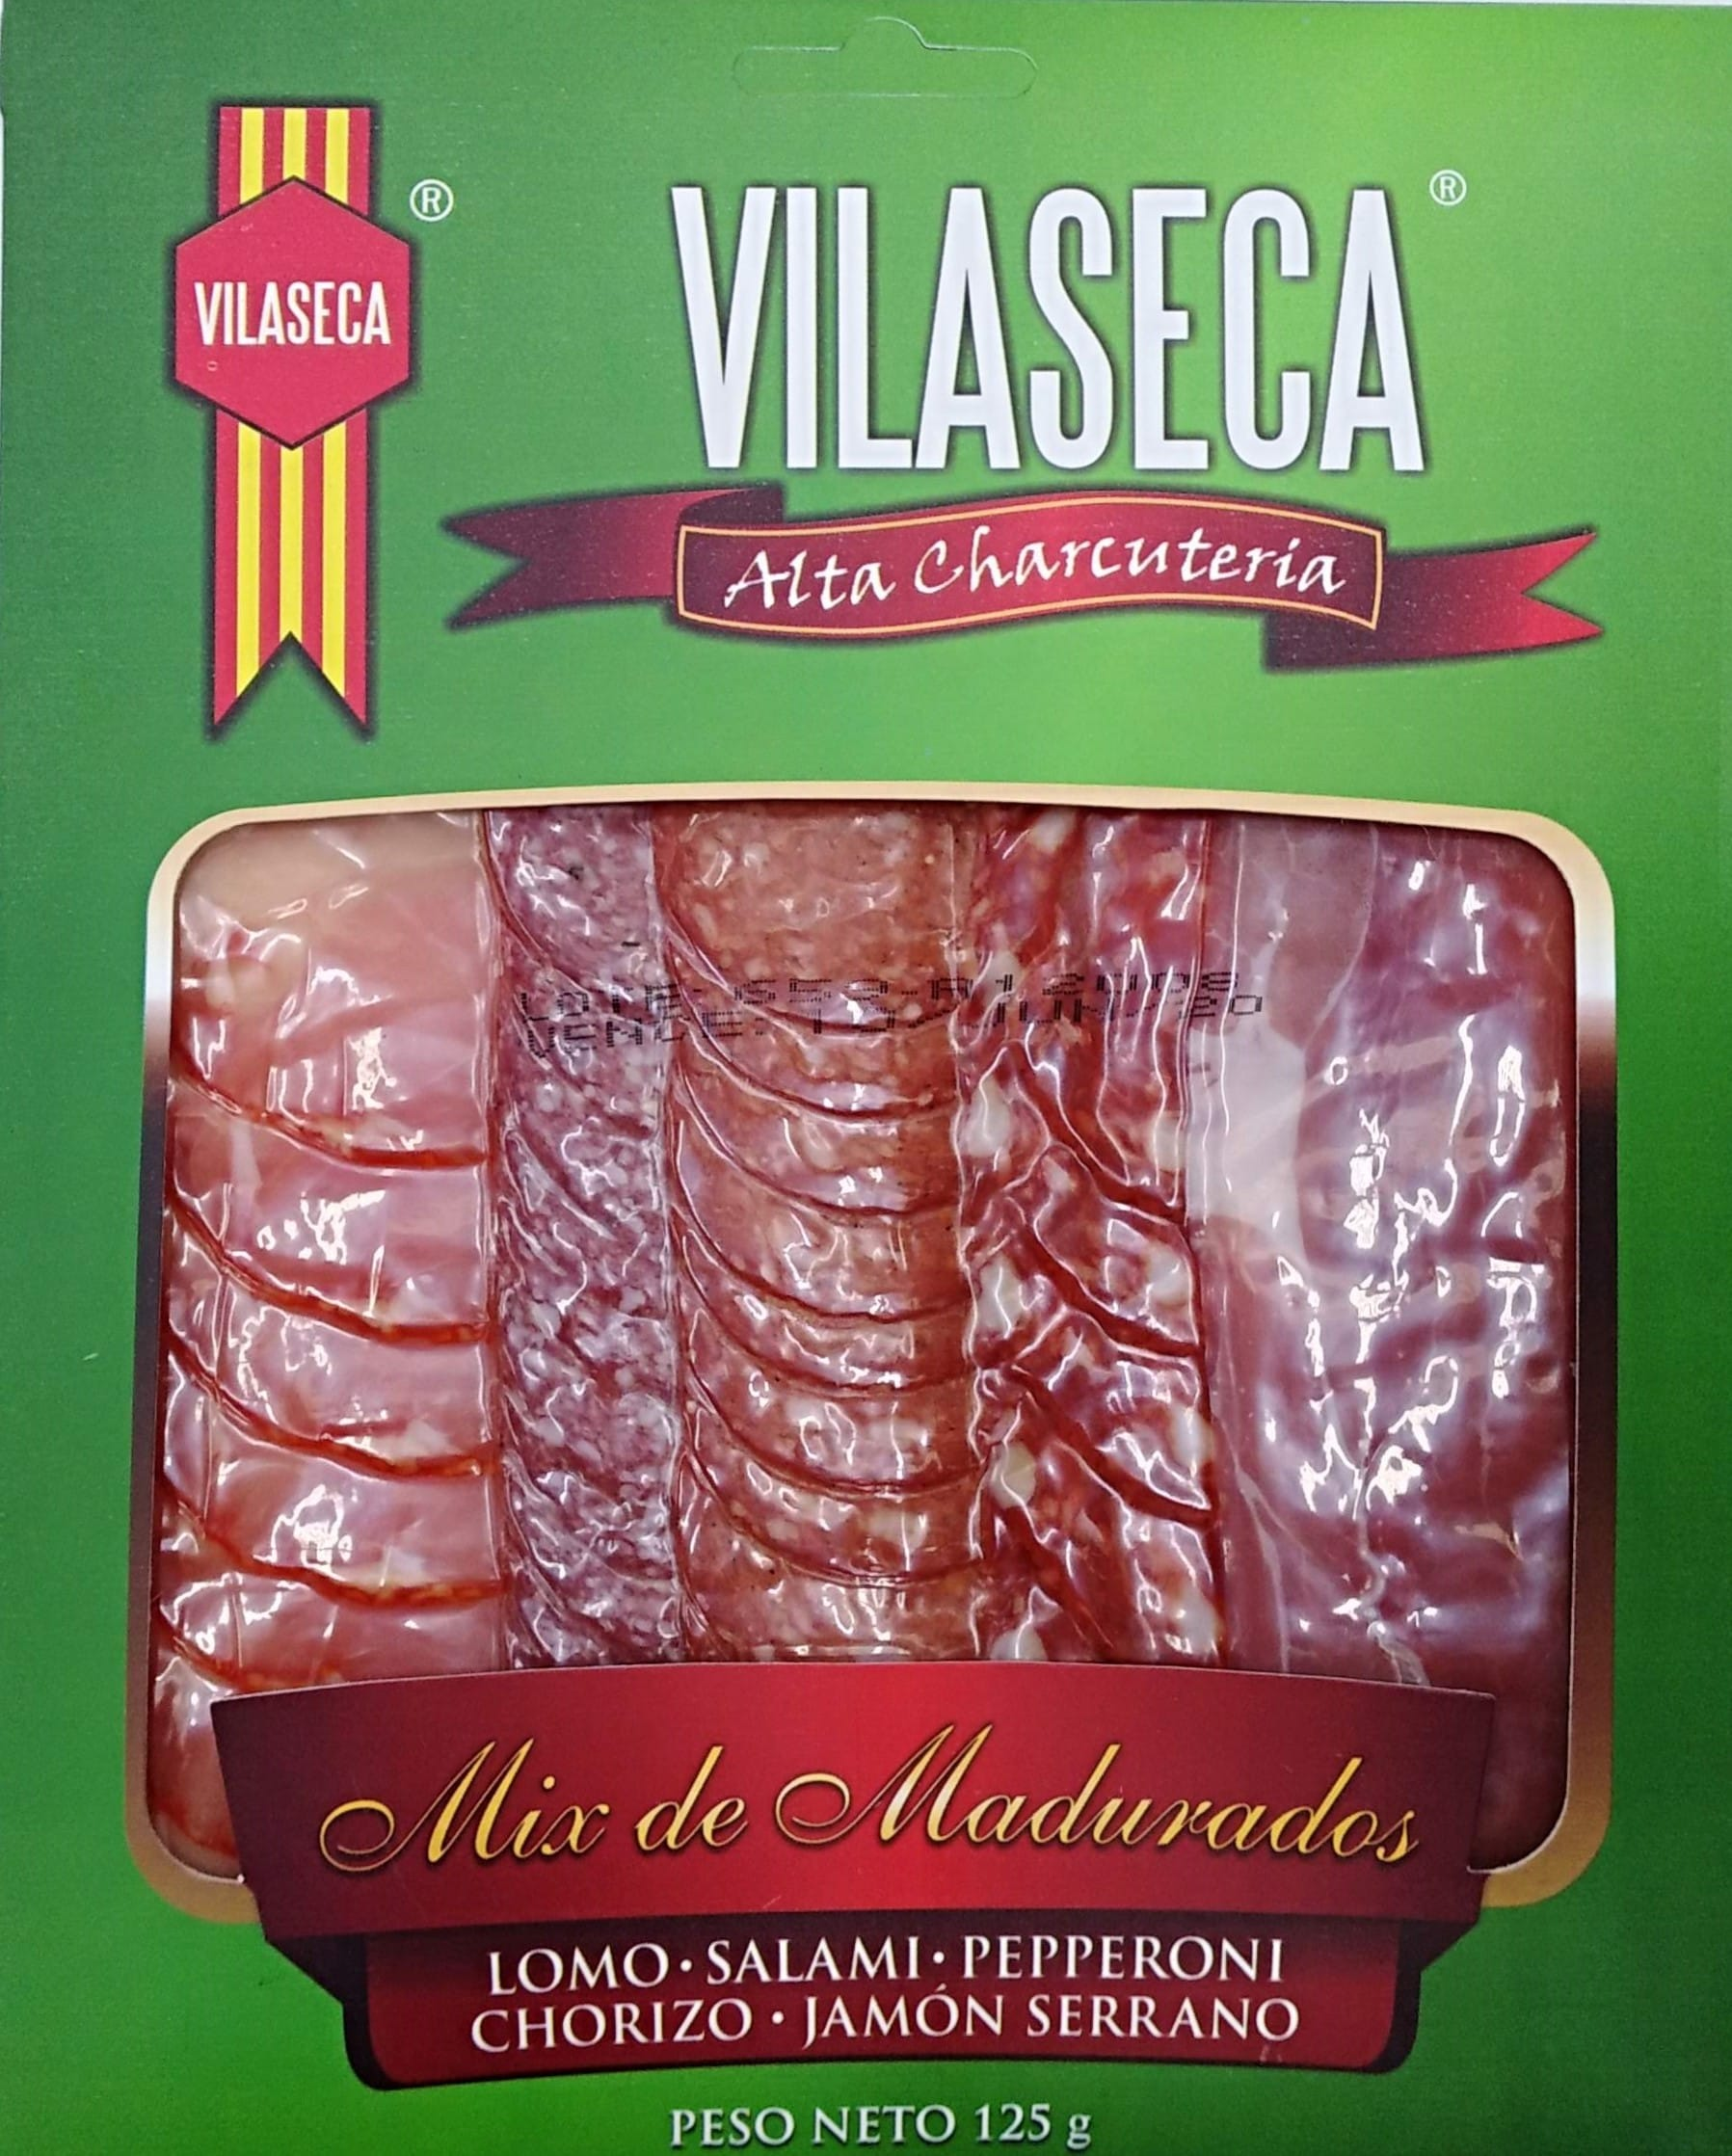 mix Madurados Vilaseca 125g